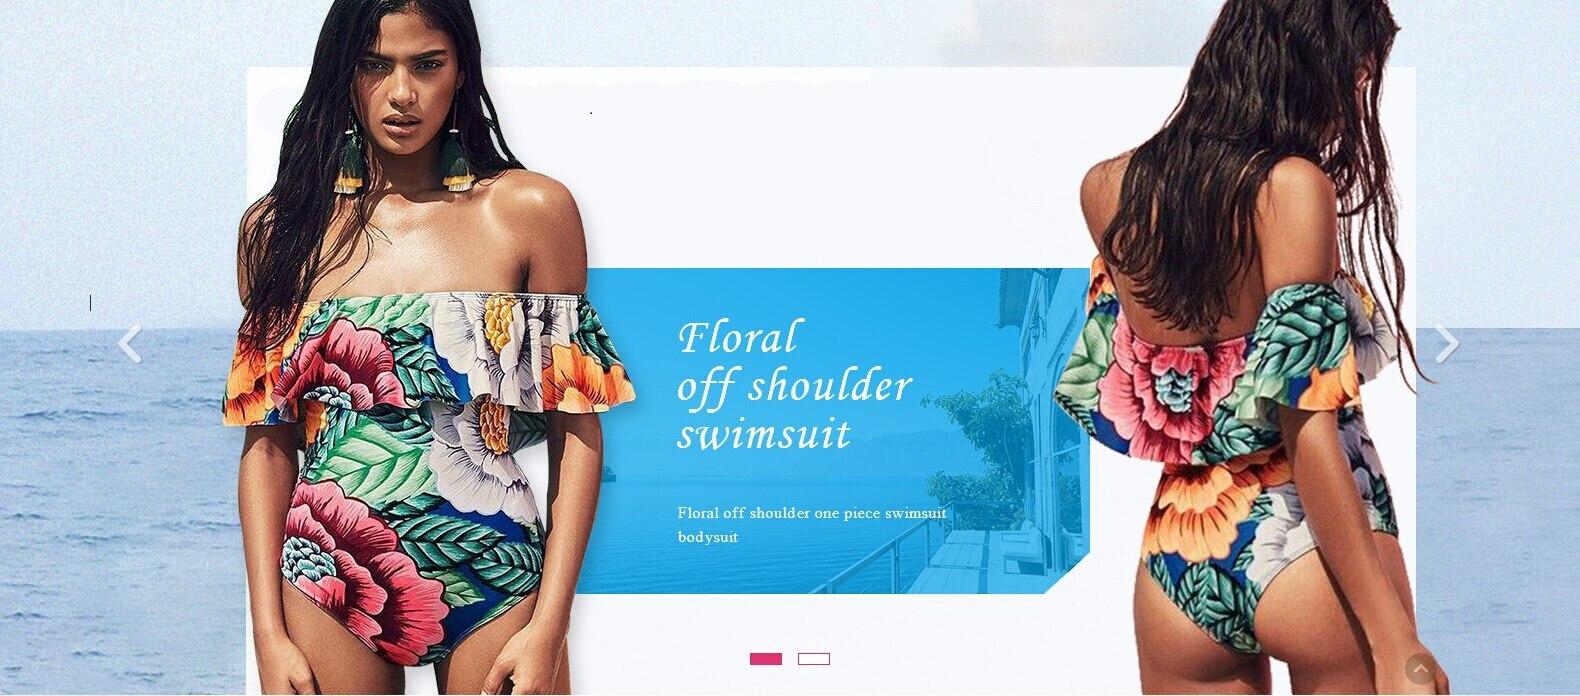 HTB1hYHhoMDD8KJjy0Fdq6AjvXXaB Sexy Thong Bikini Set 2019 Women Swimwear Bandage Push Up Padded Swimsuit Summer Beach Women Bathing Suit Brazilian Monokini Hot